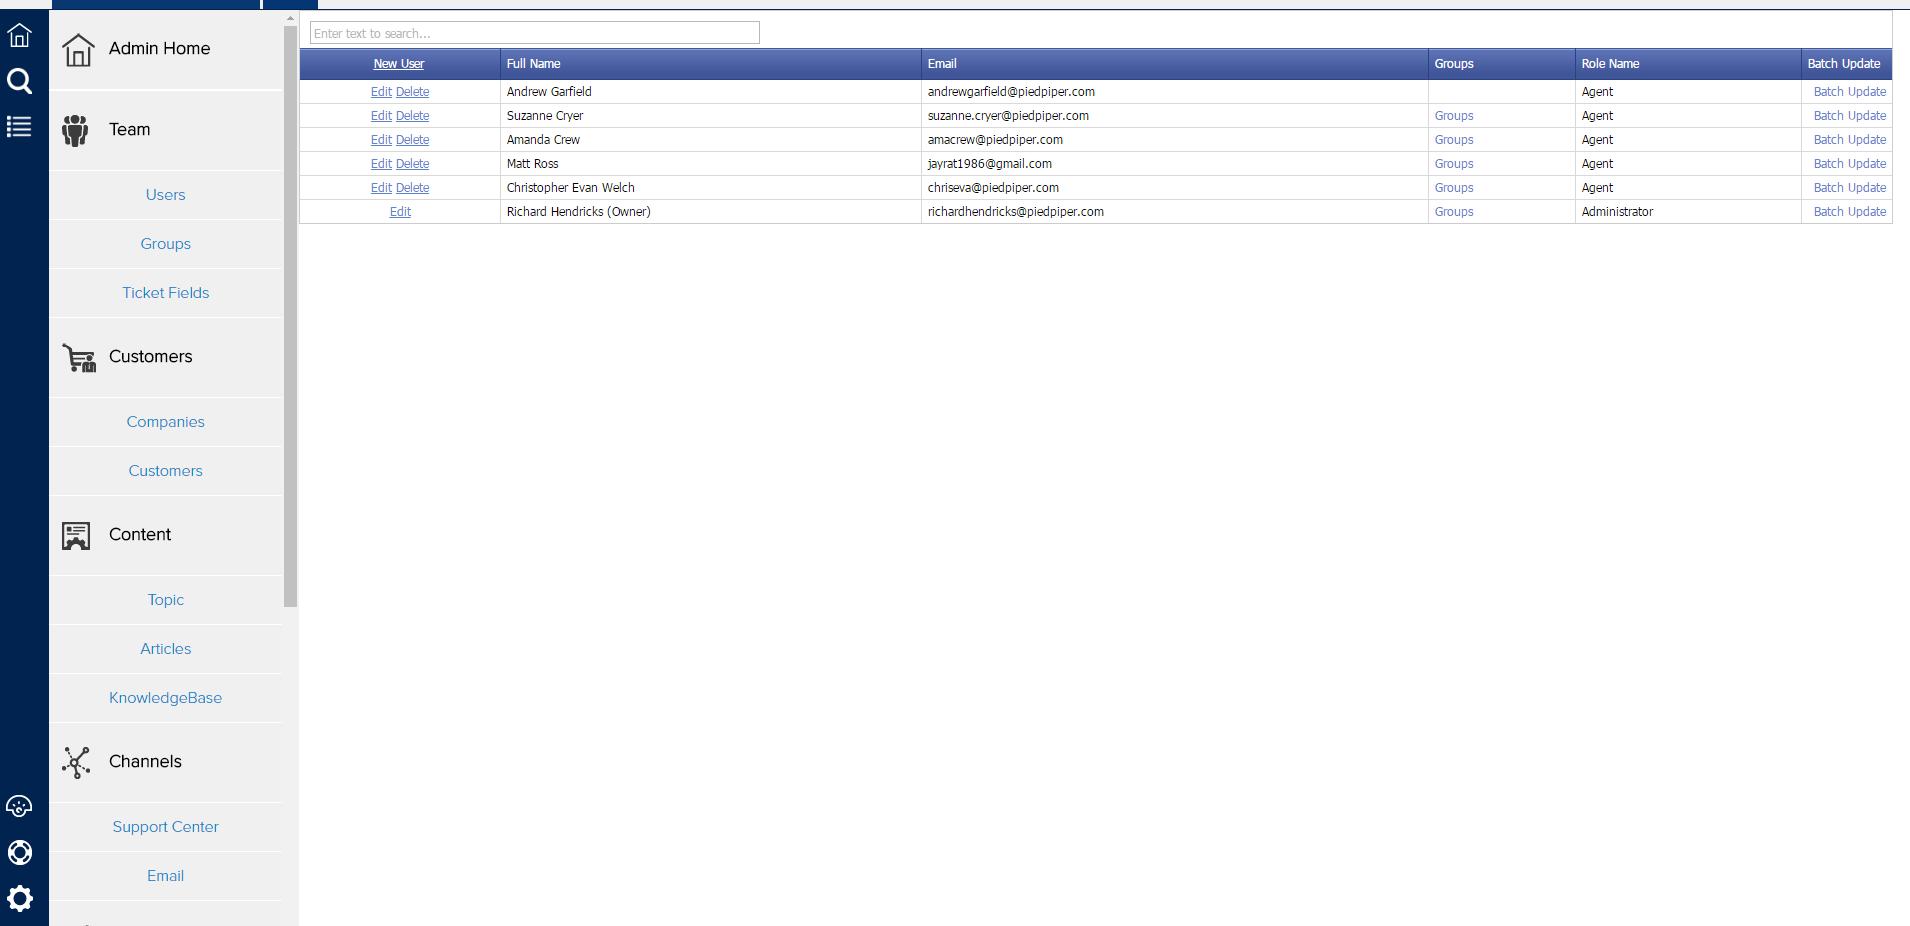 AzureDesk Demo - Admin.png